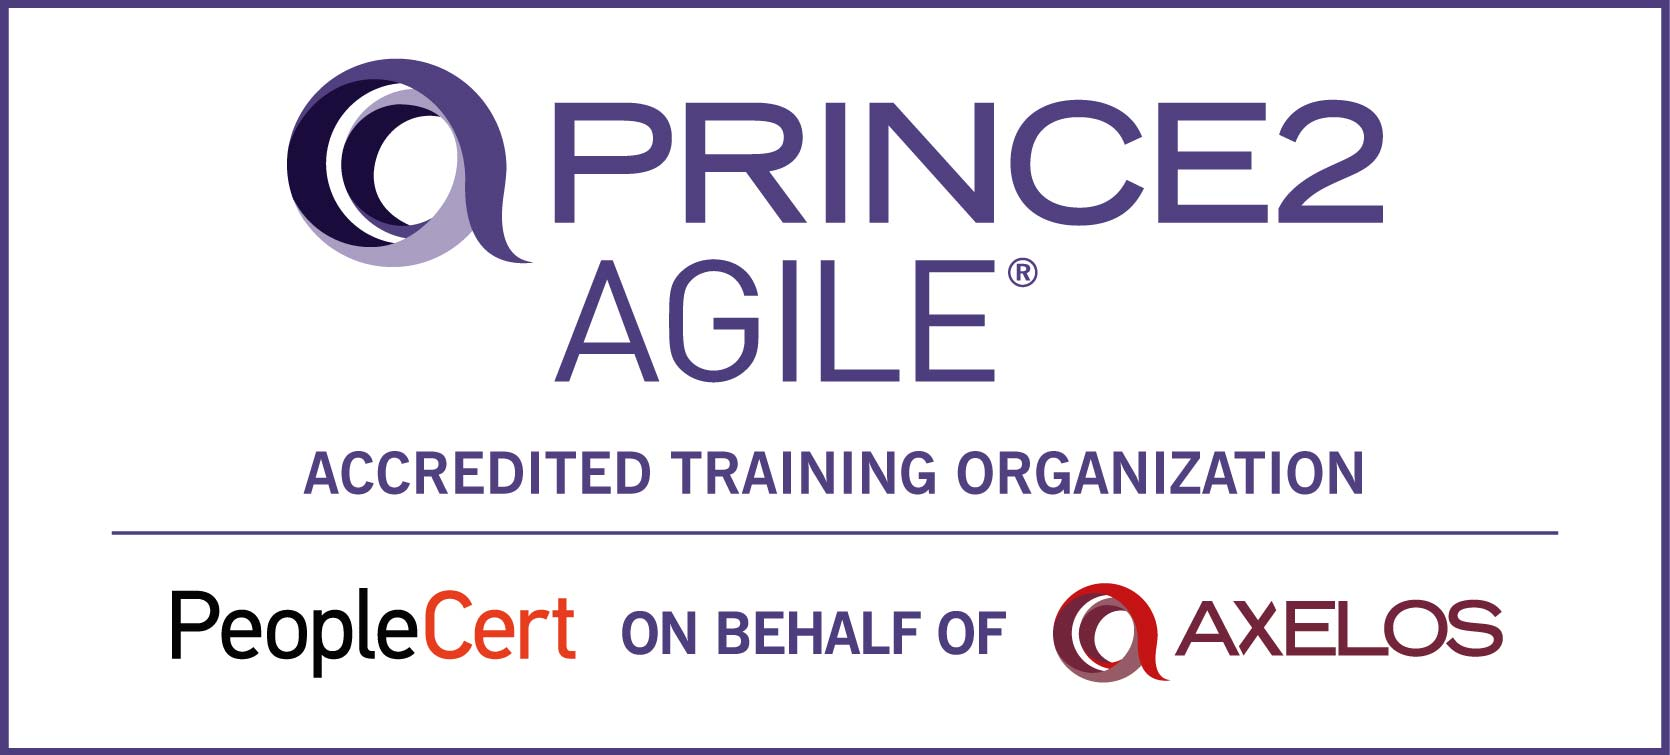 prince2-agile-qrp